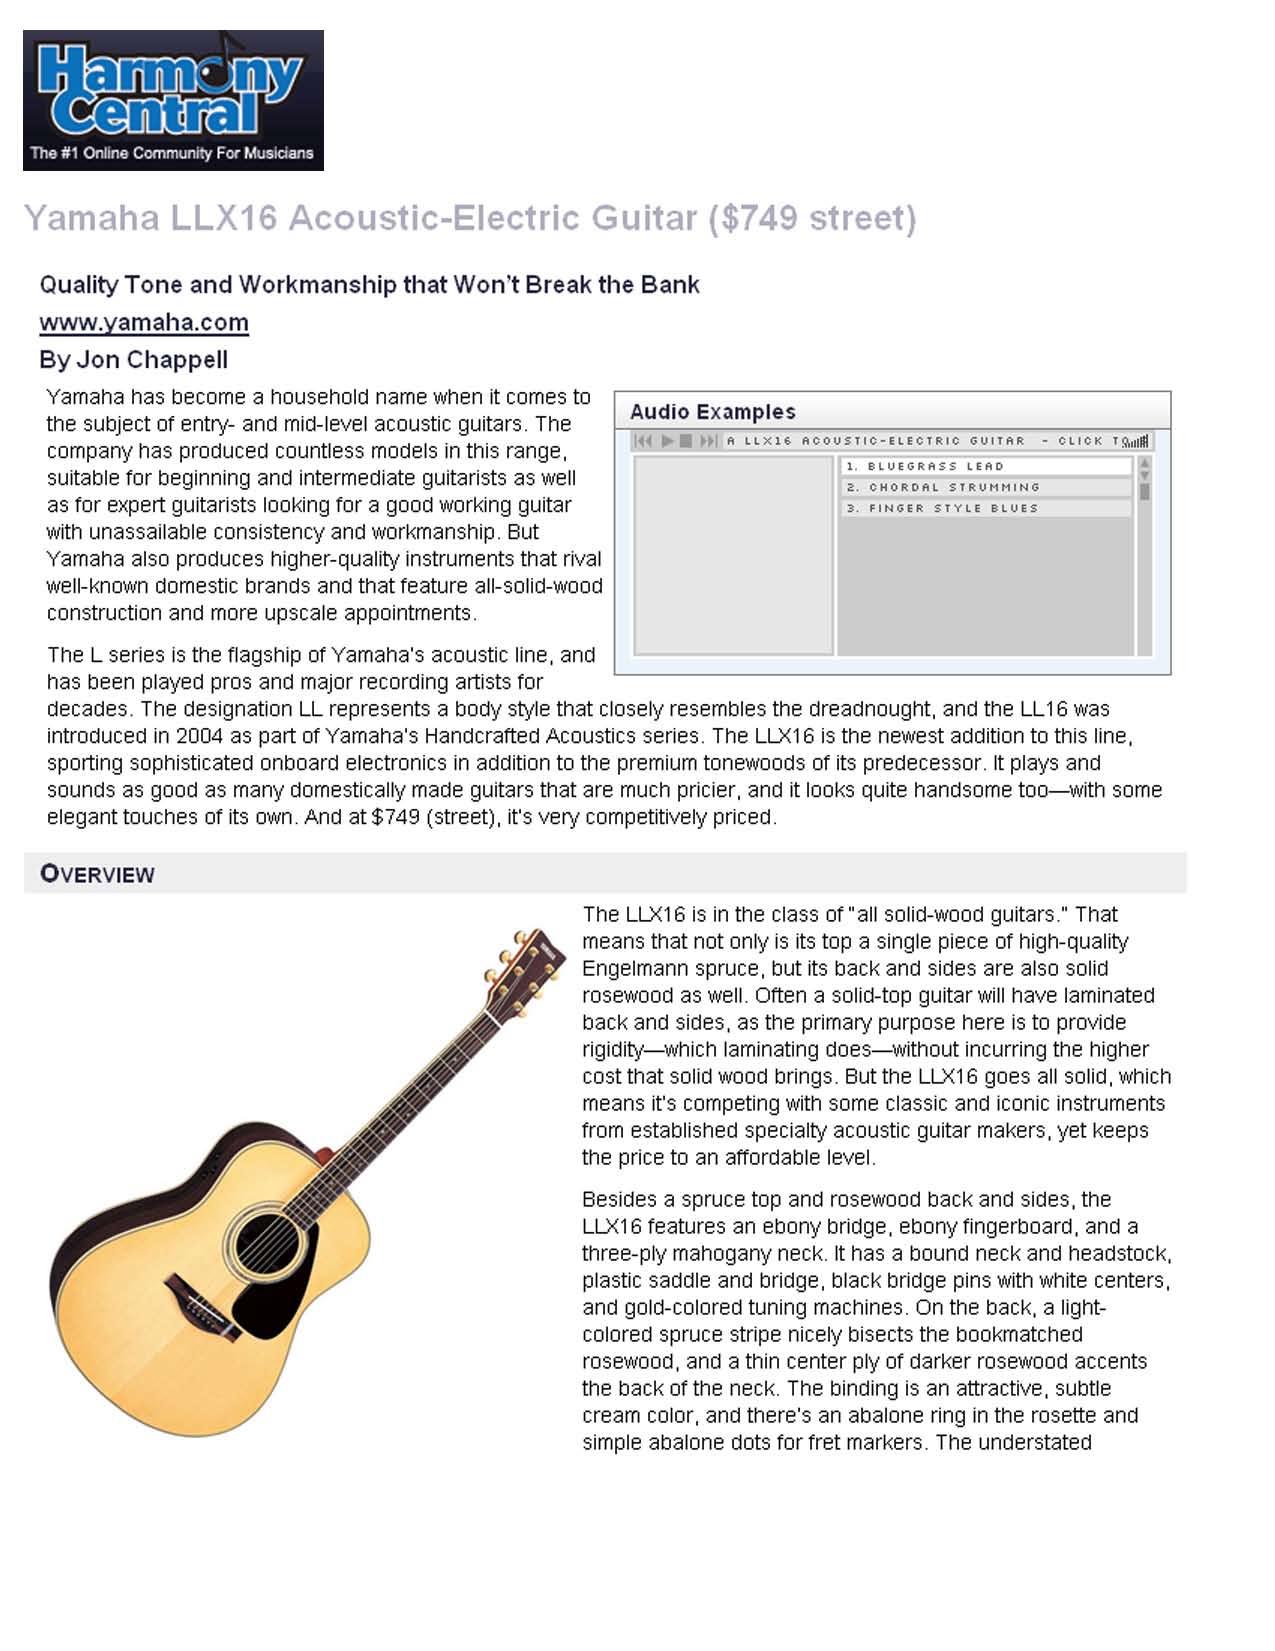 pdf for Yamaha Guitar LLX16 manual